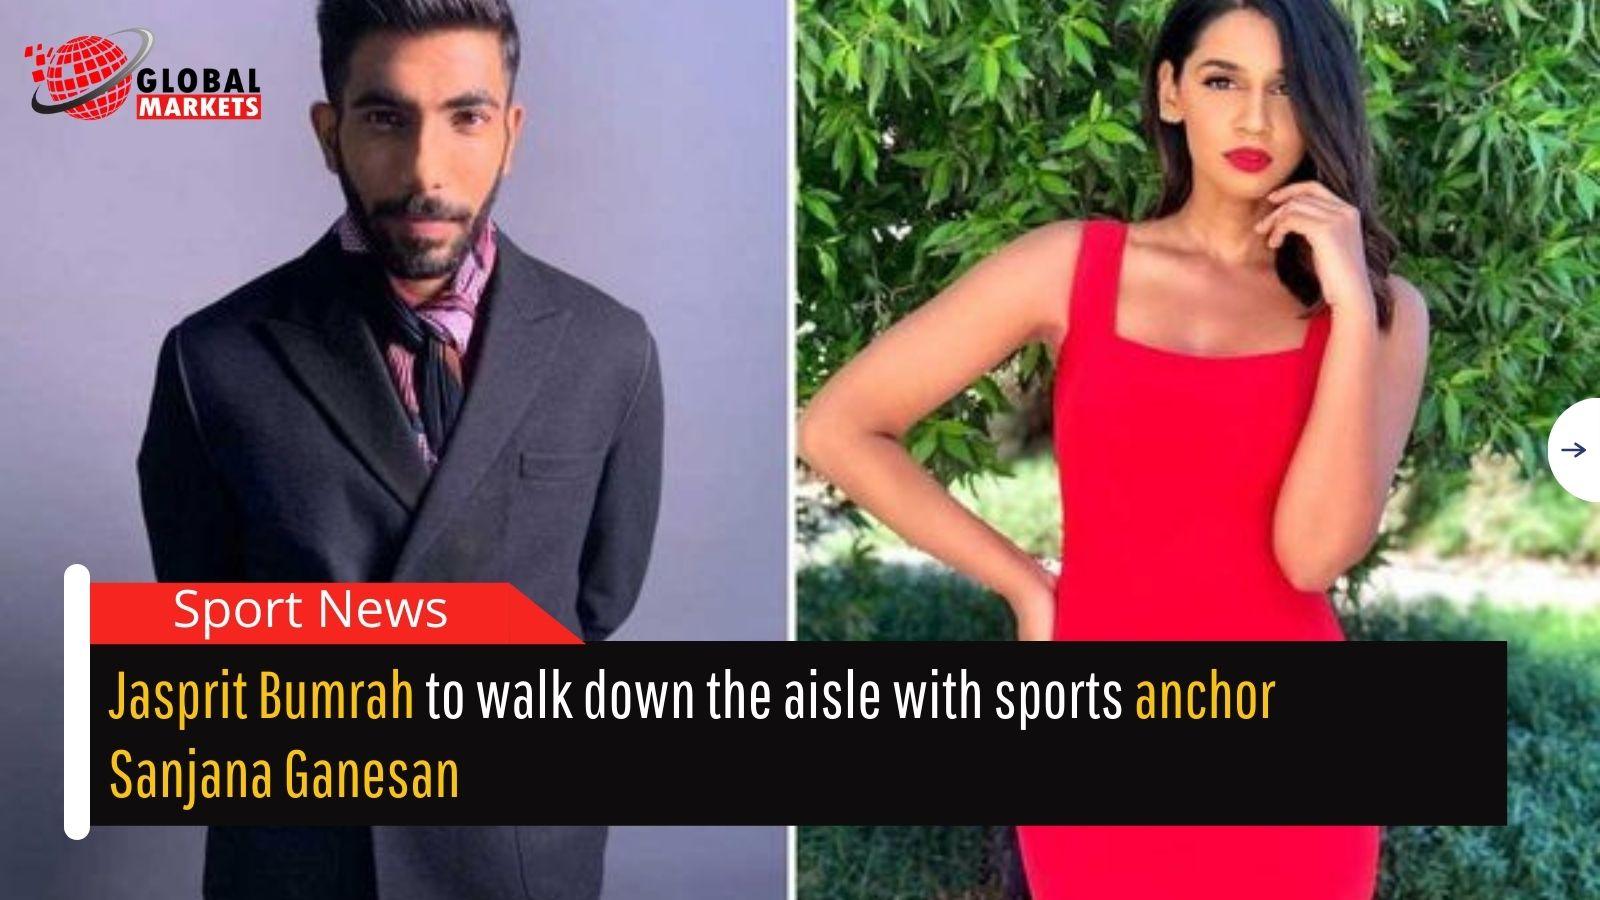 Jasprit Bumrah to walk down the aisle with sports anchor Sanjana Ganesan